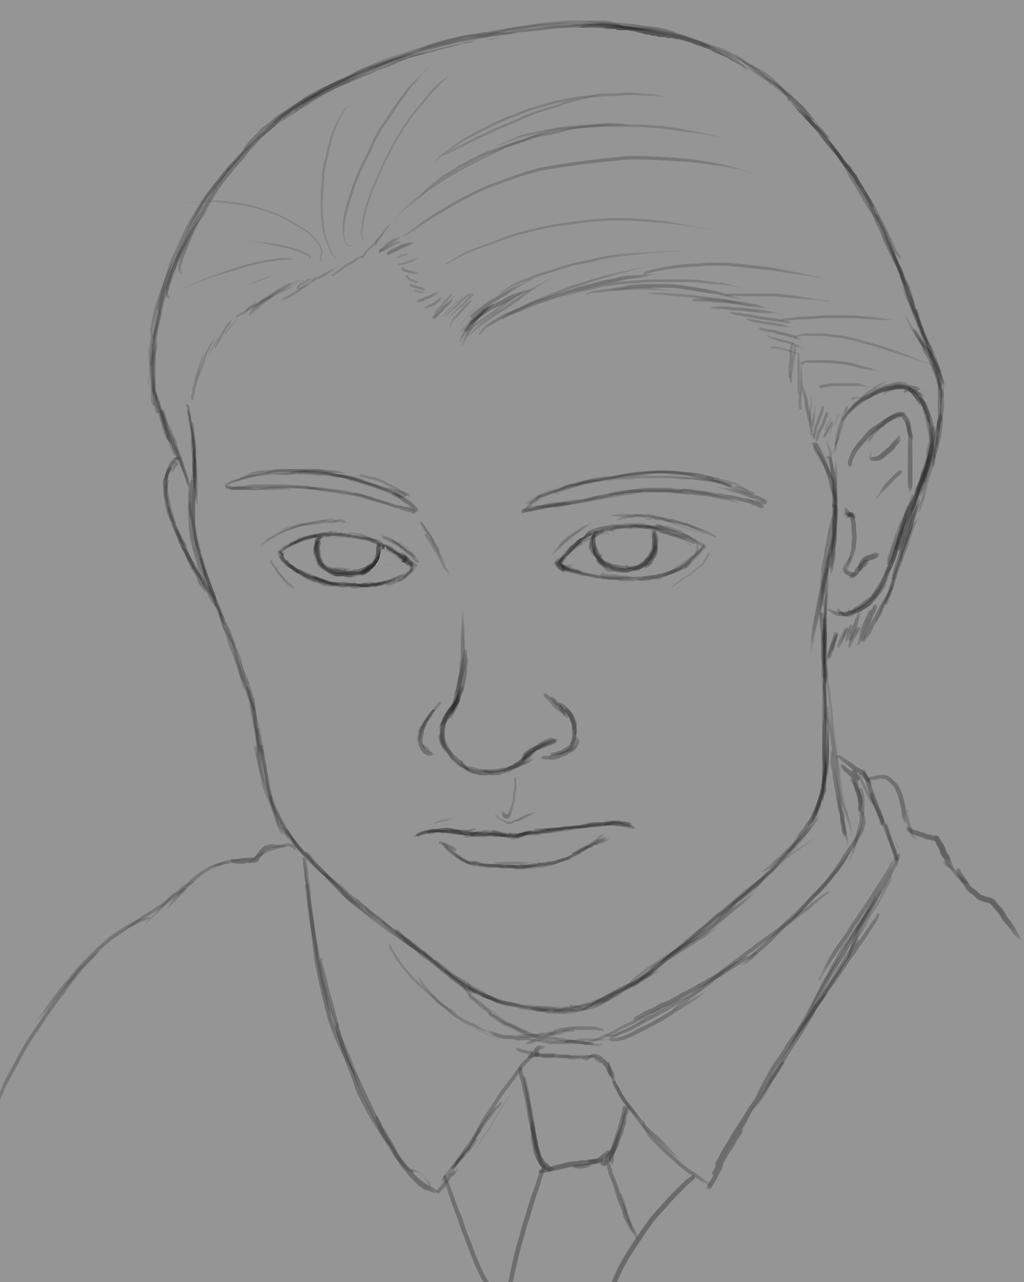 Draco Daily sketch #557 by GothicVampireFreak